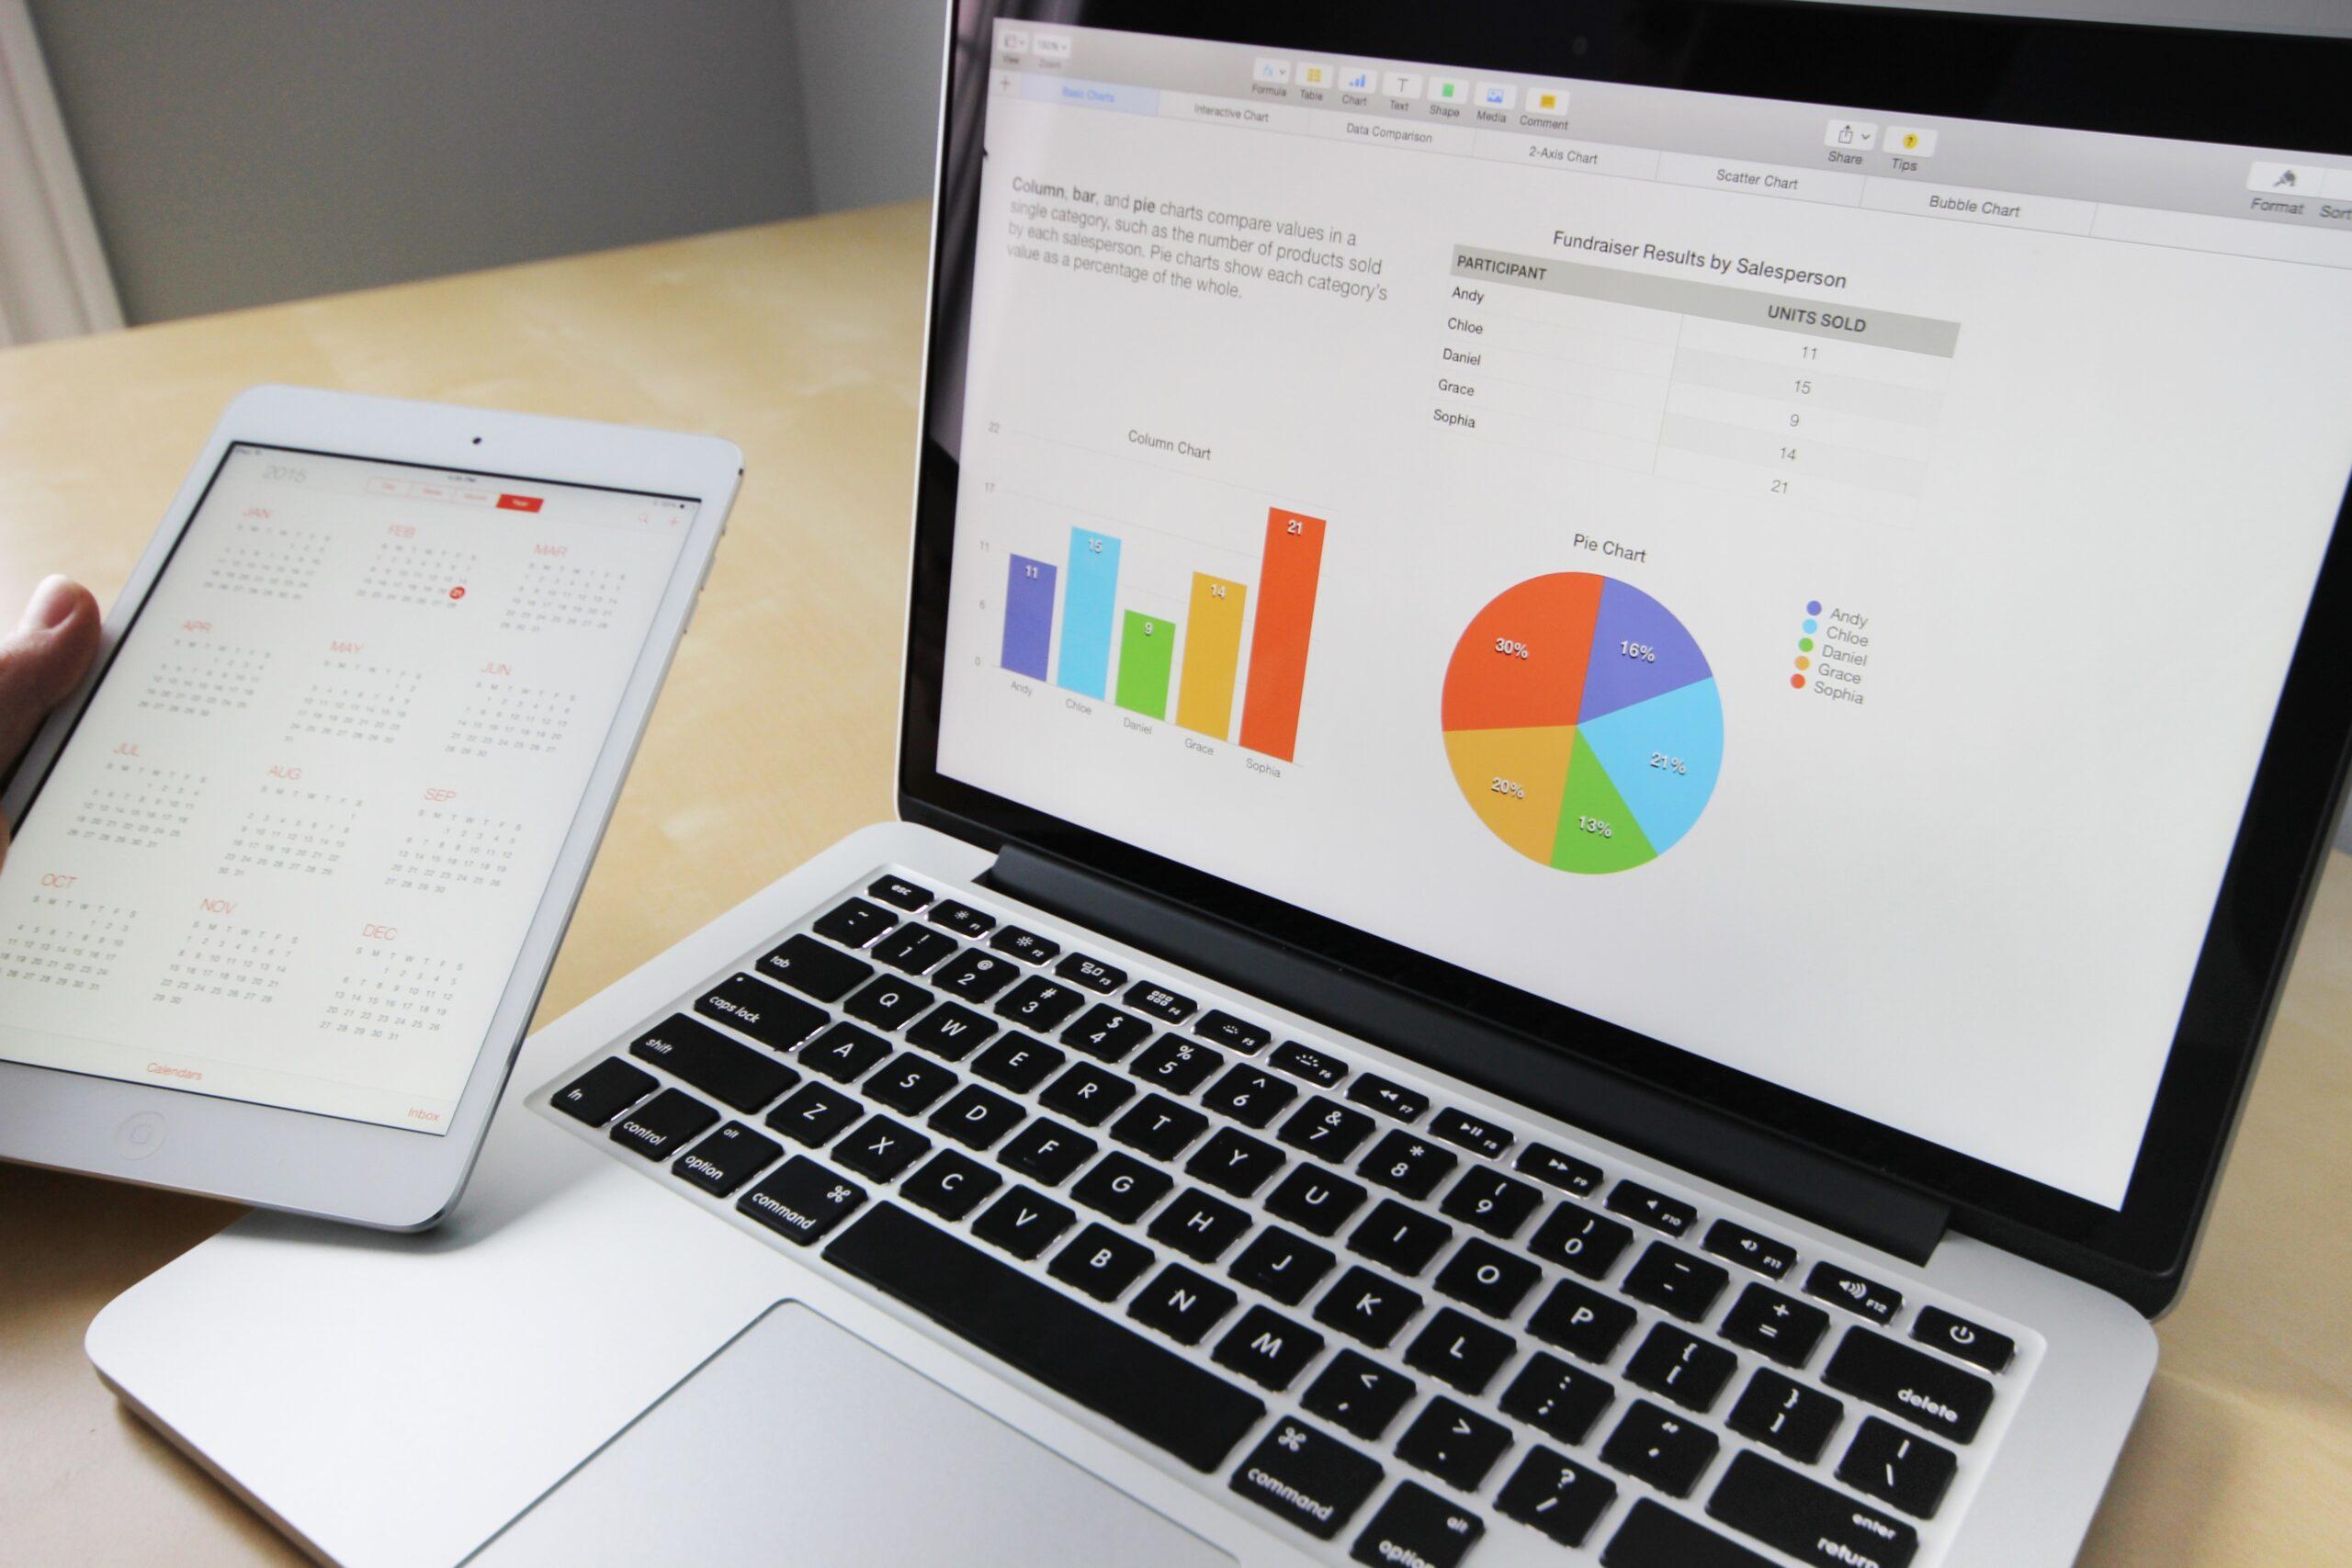 Check Out IAC's Data Portal!